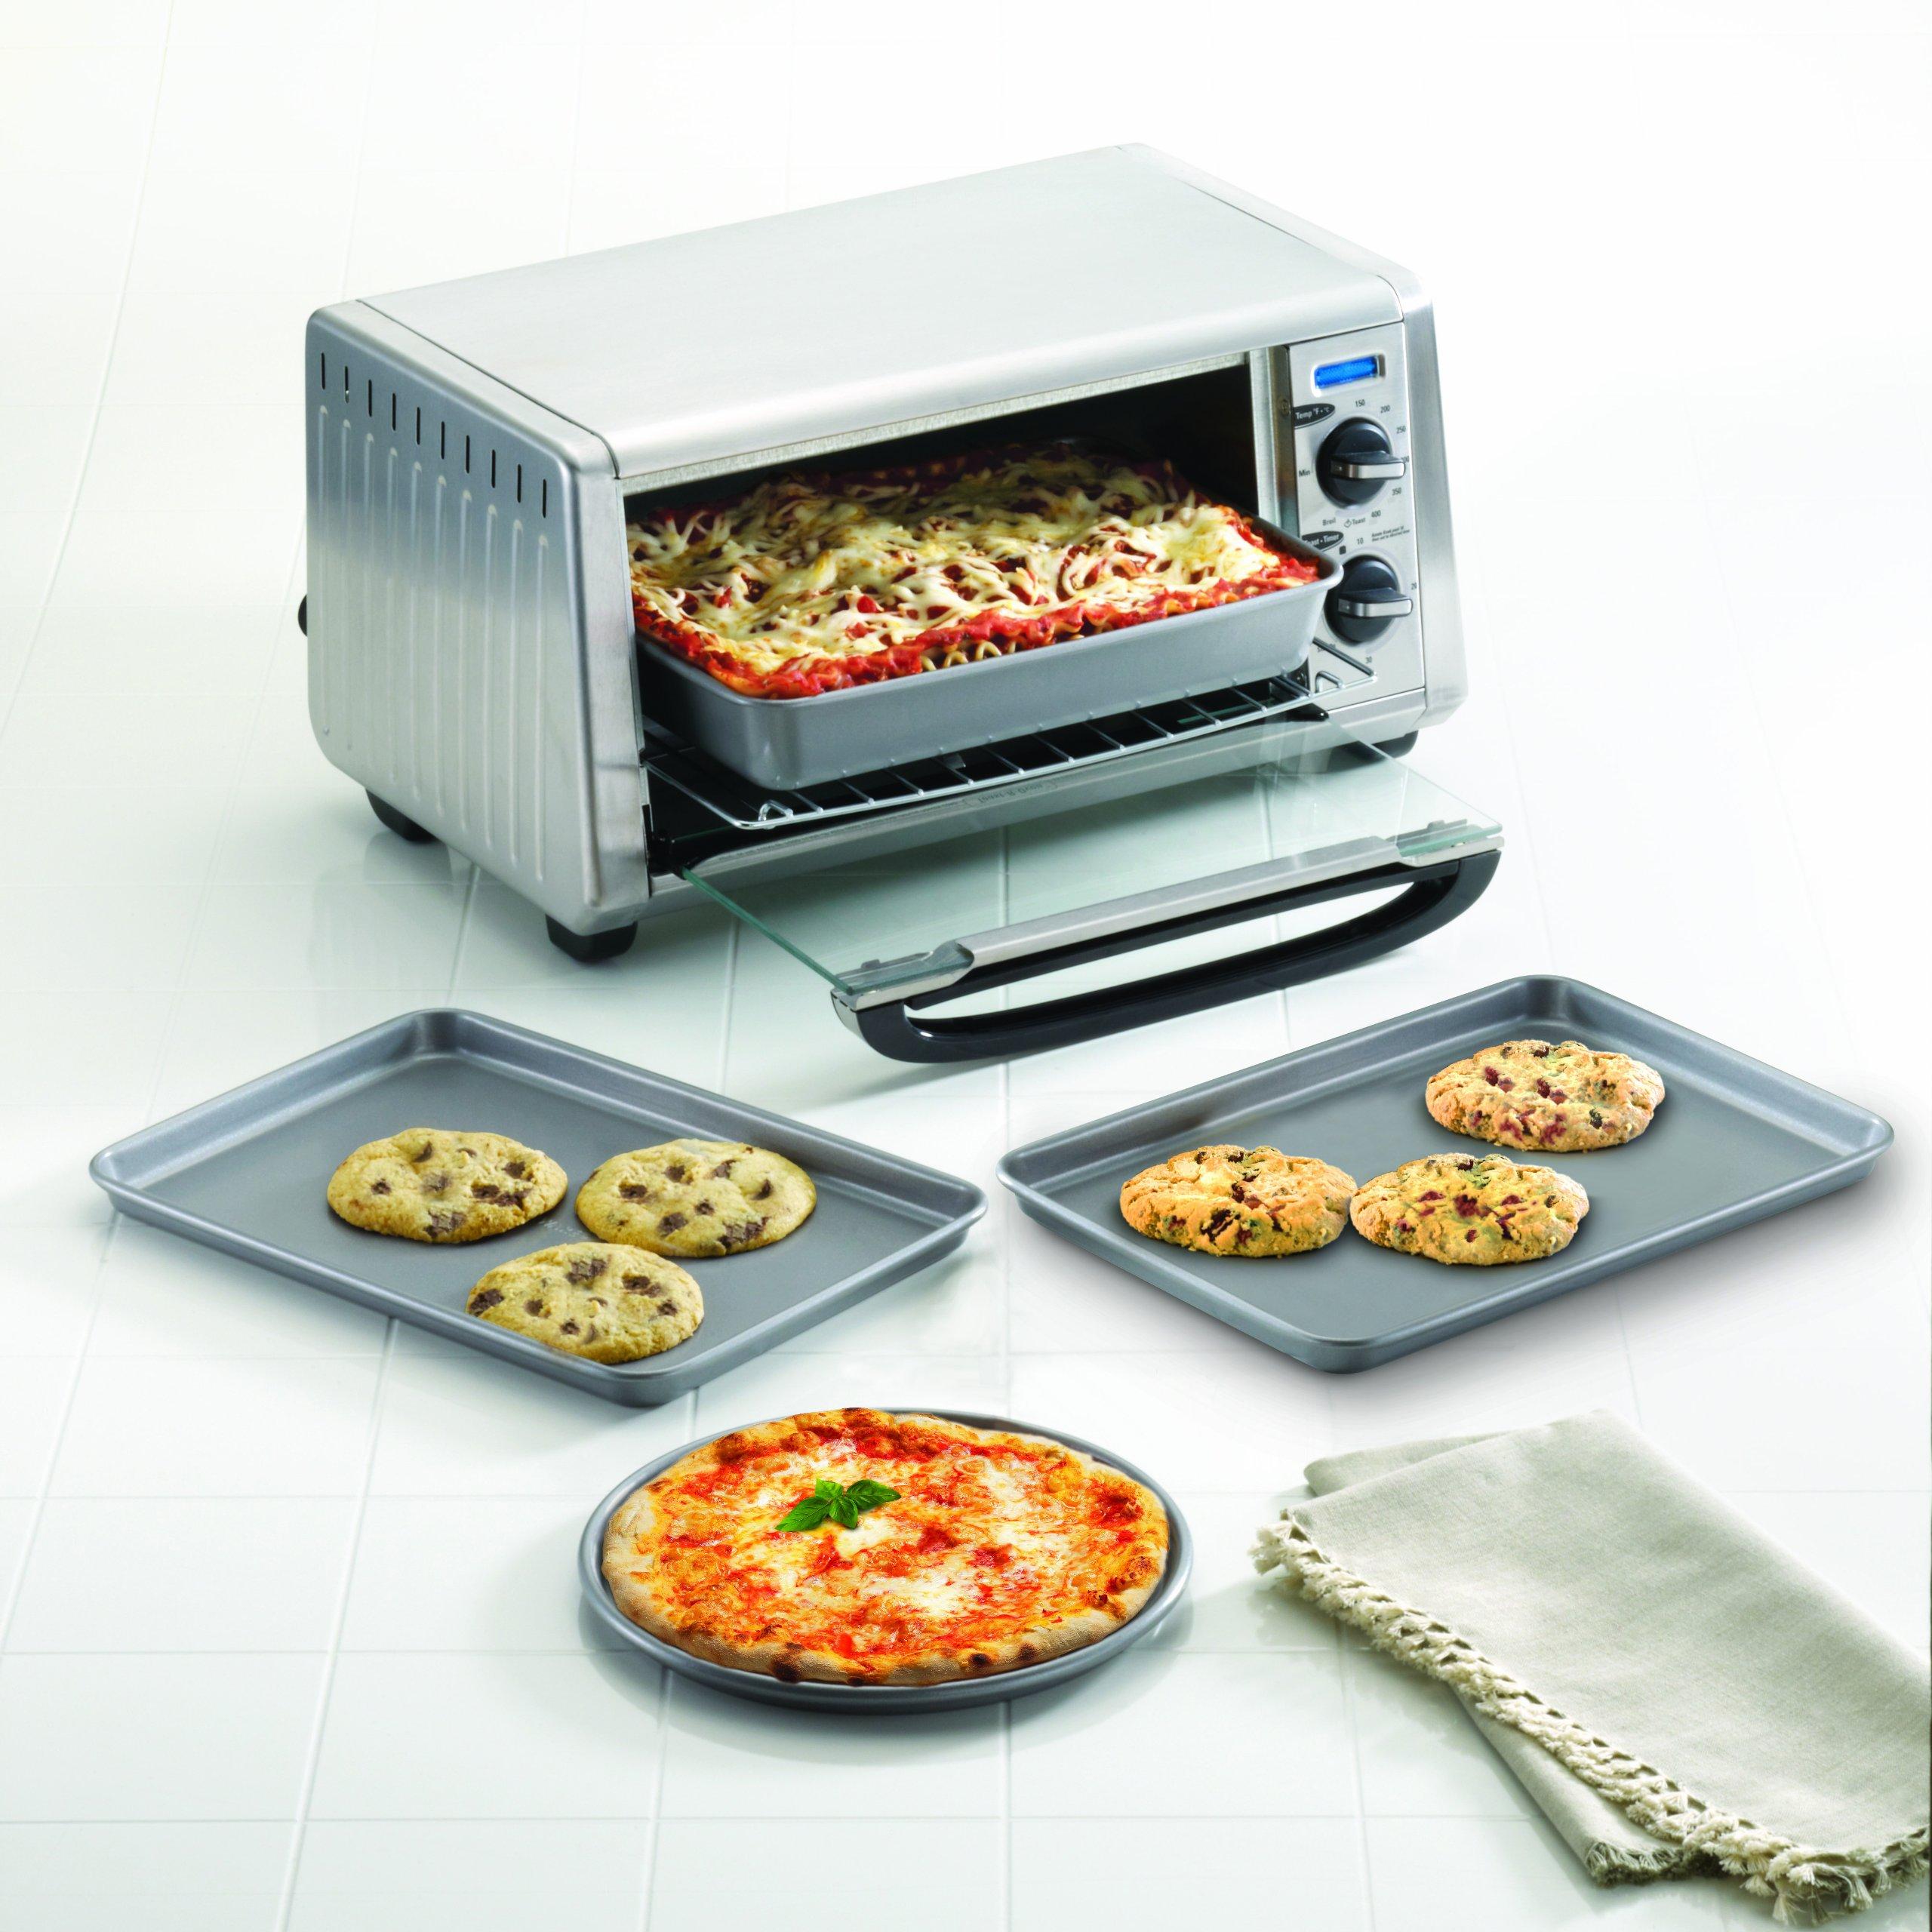 Farberware Nonstick Bakeware 4-Piece Toaster Oven Set, Gray by Farberware (Image #4)